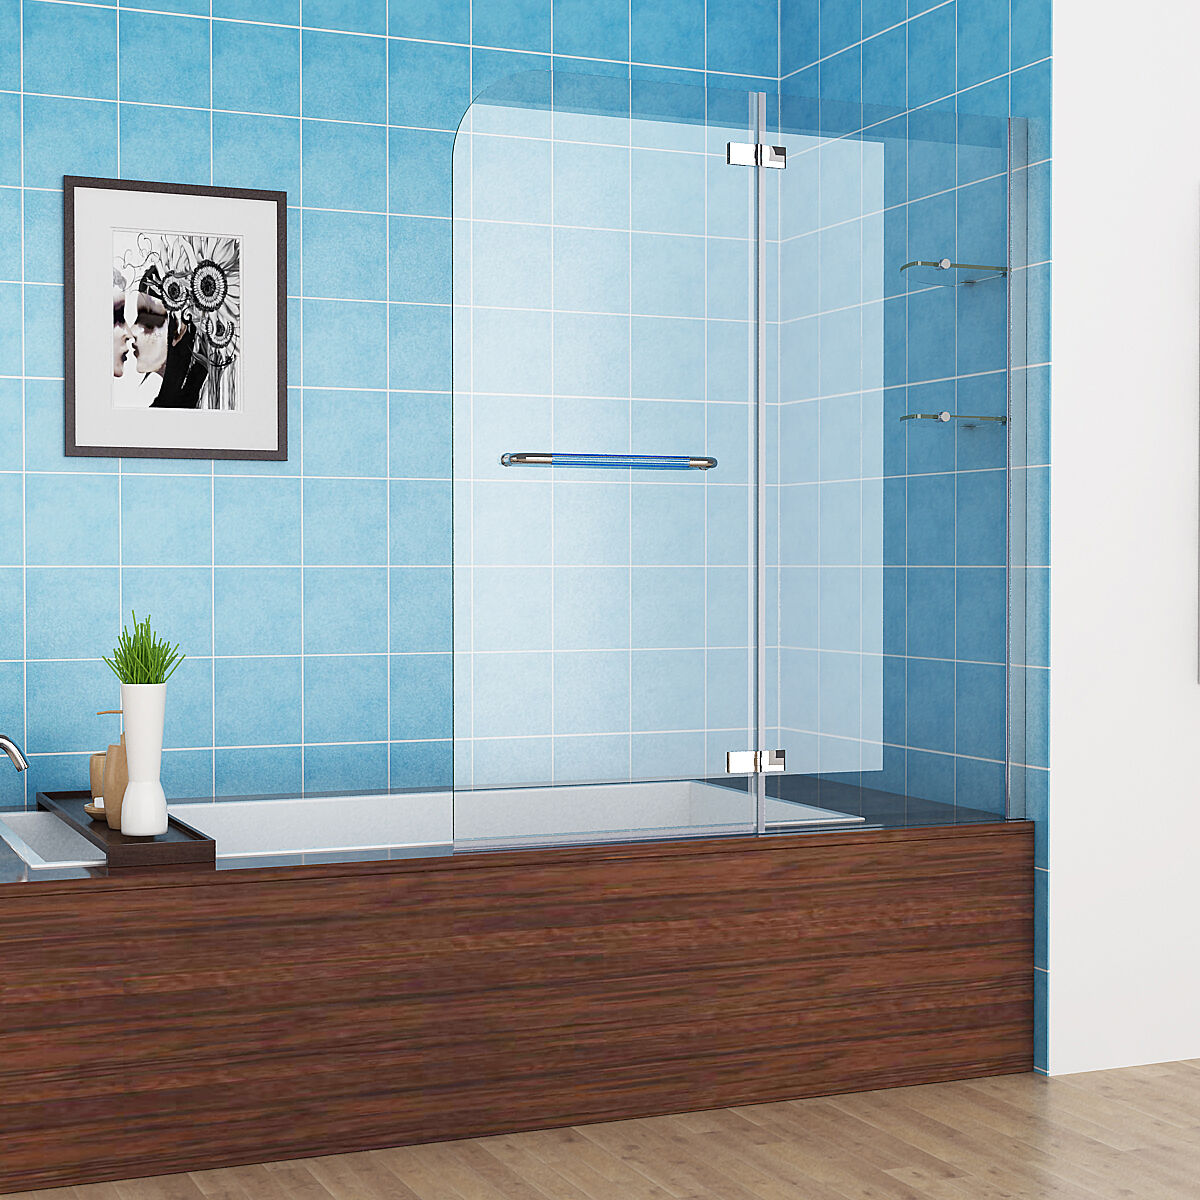 120 X 140 Cm Badewannen 2 Tlg. Faltwand Aufsatz 180° Duschwand